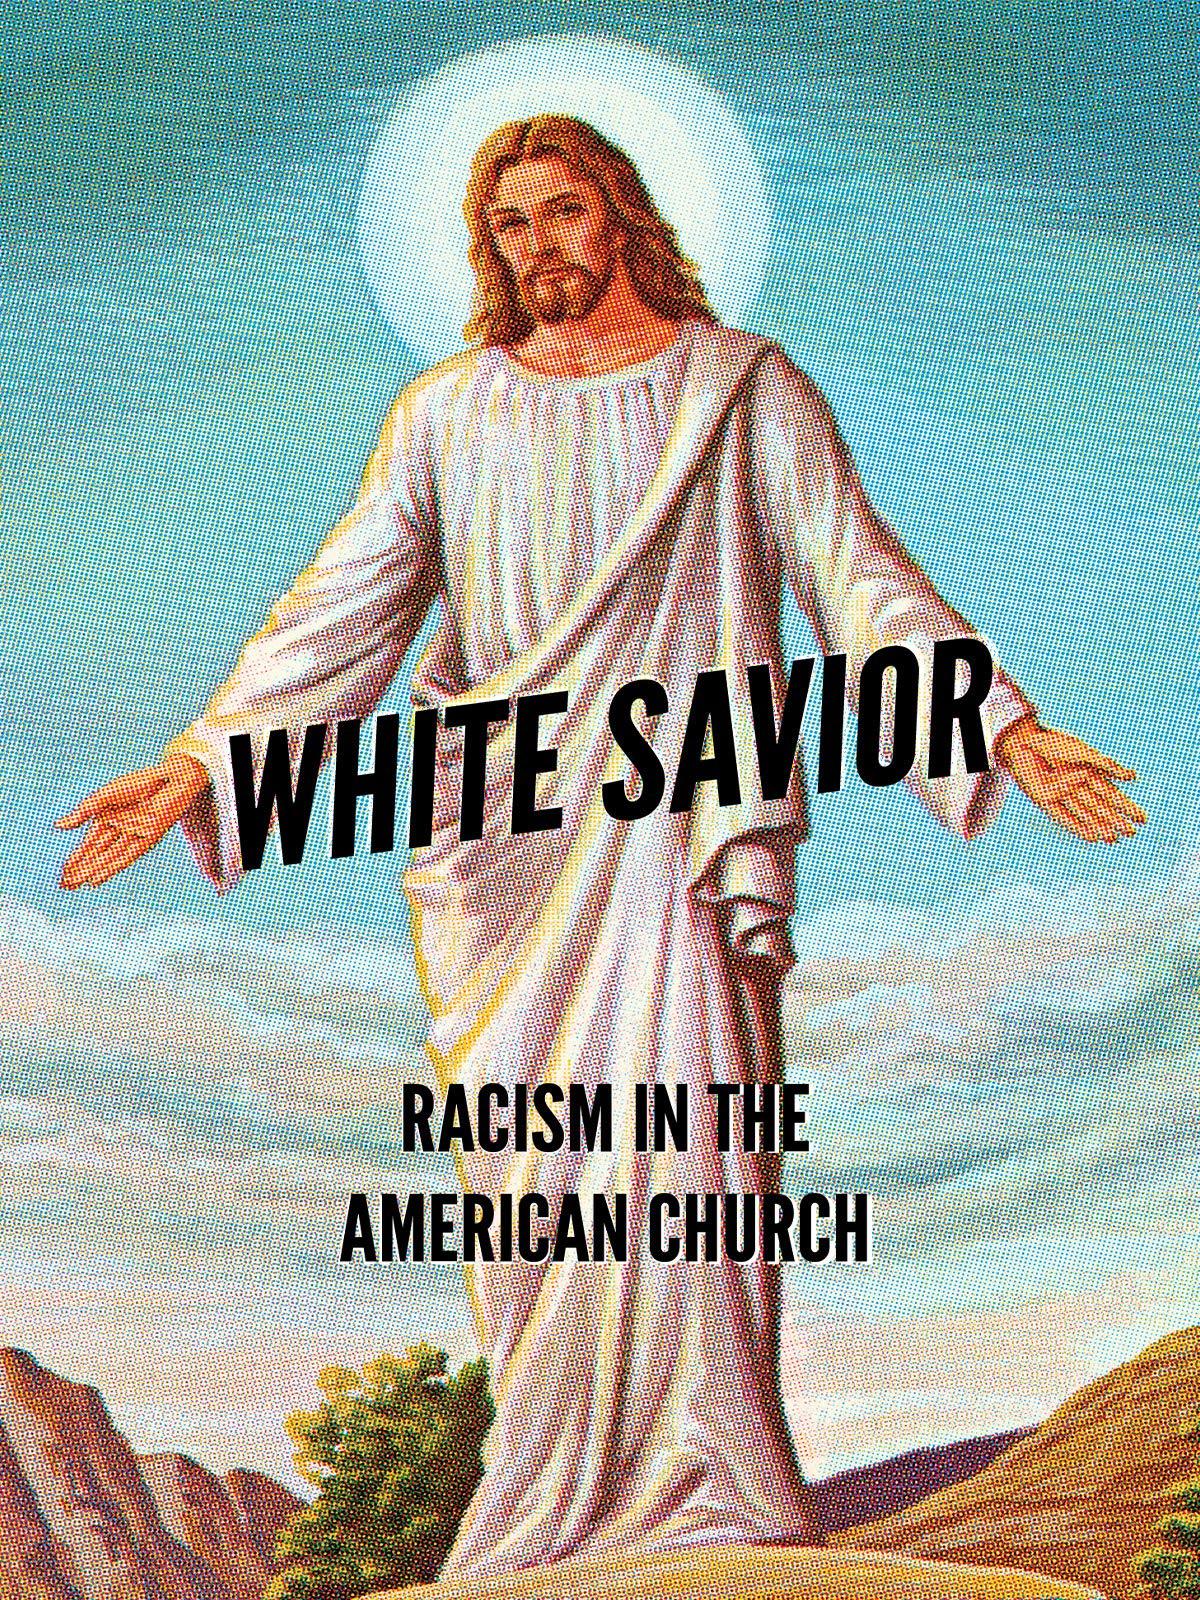 White Savior: Racism In The American Church on Amazon Prime Video UK